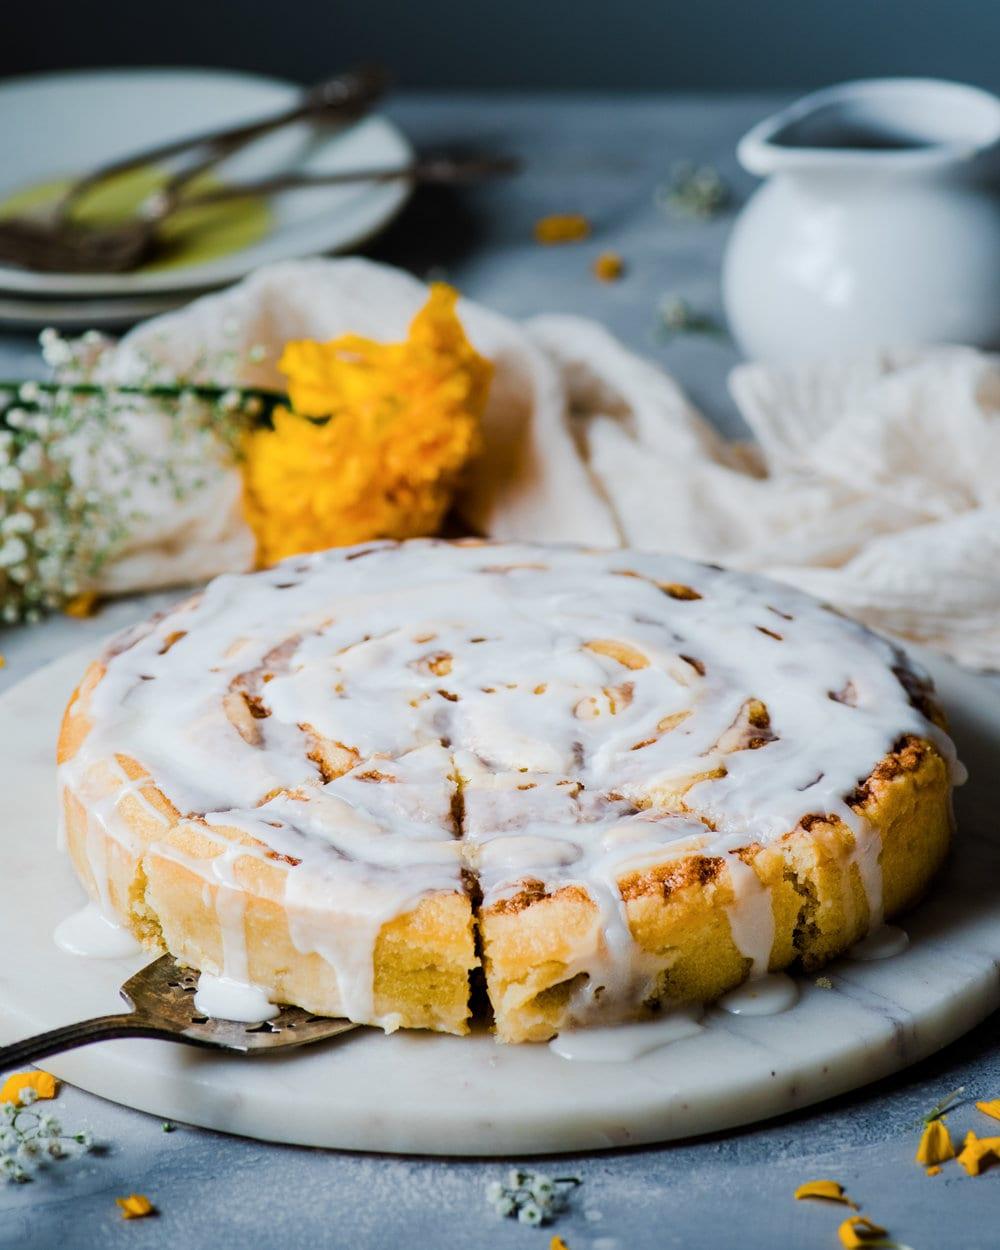 Vegan Cinnamon Roll Cake